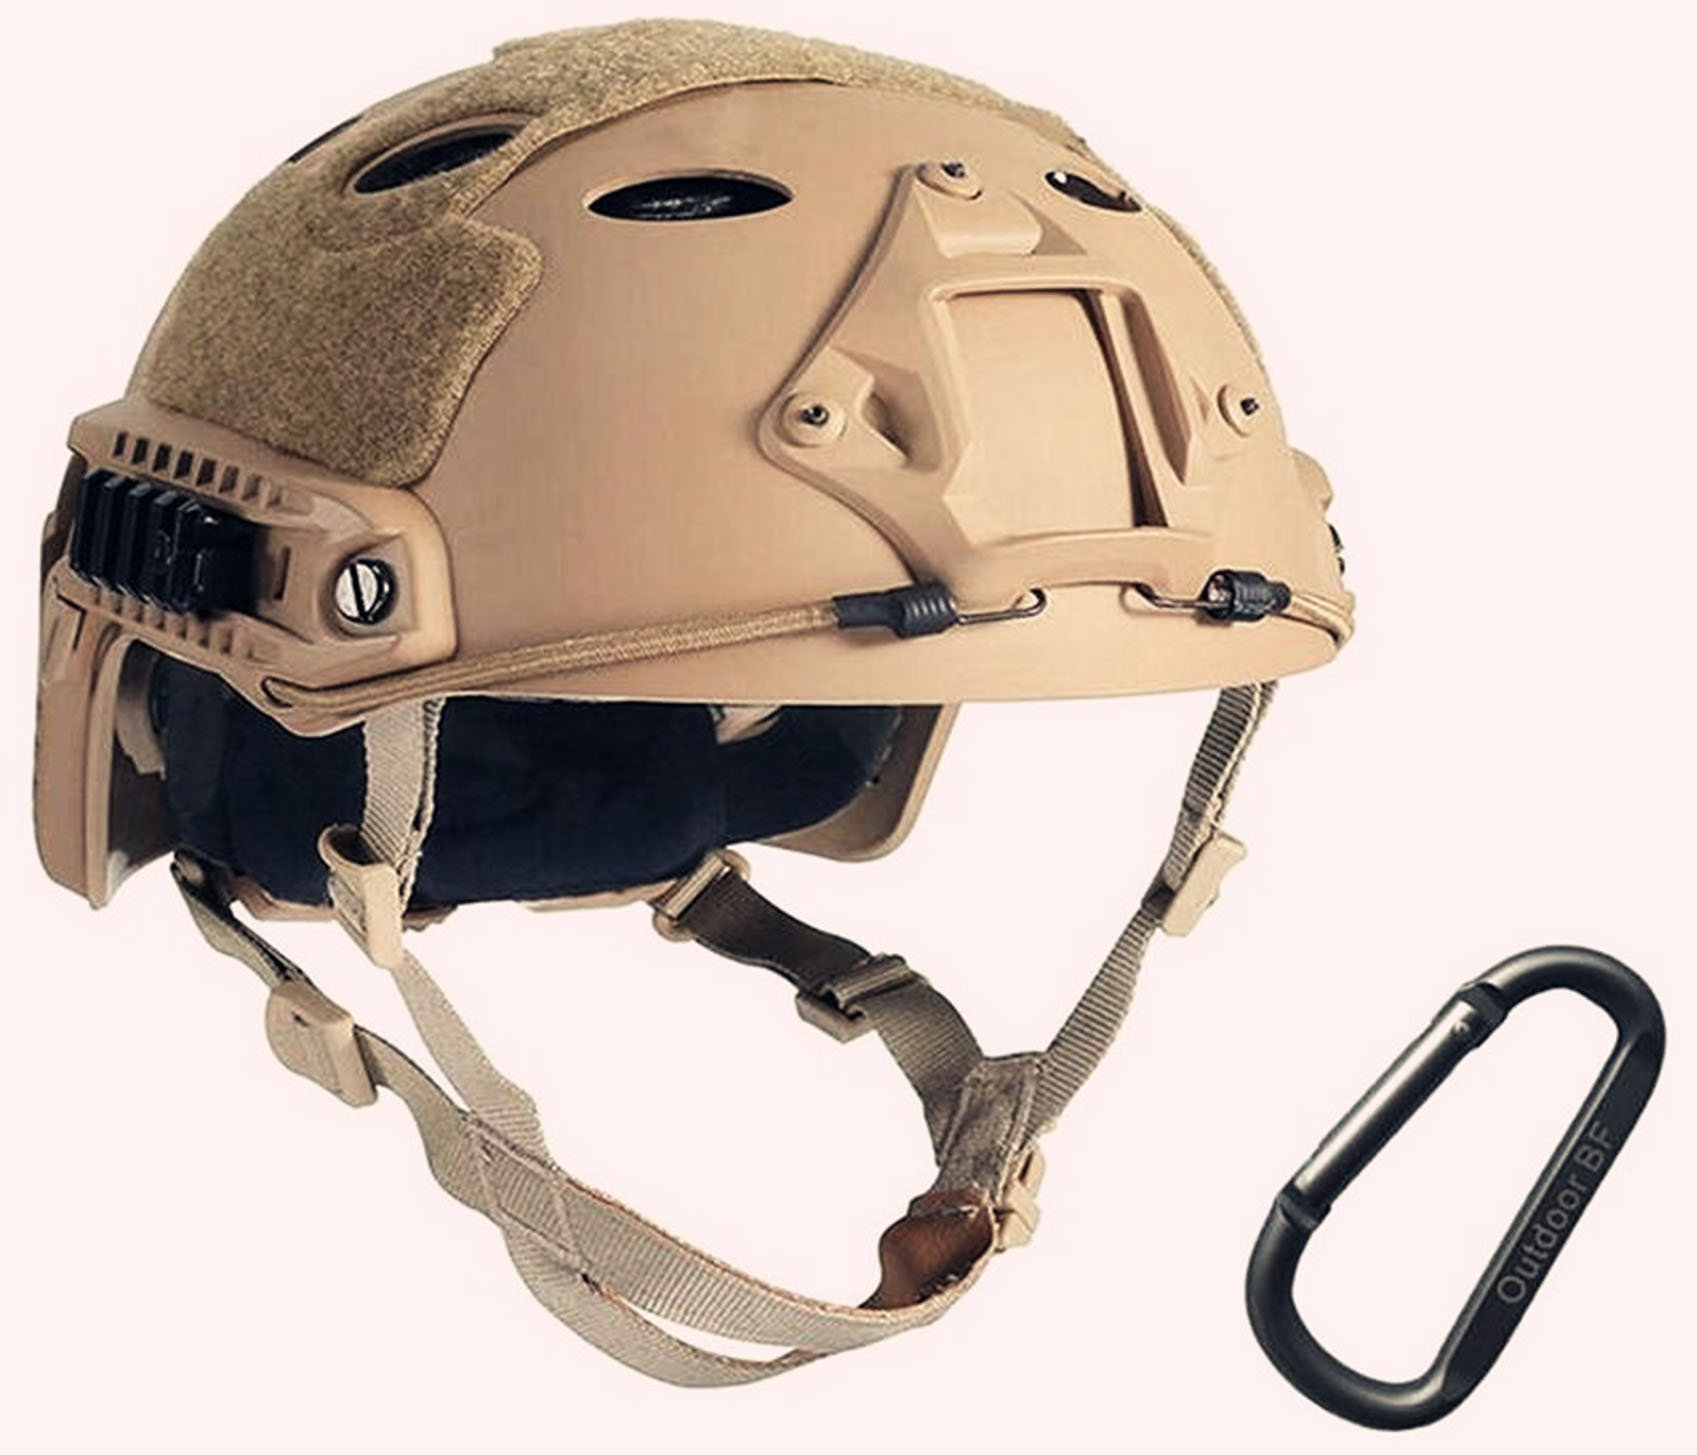 Tactical Fast Adjustable Helmet PJ Type (Tan) by Outdoor BF